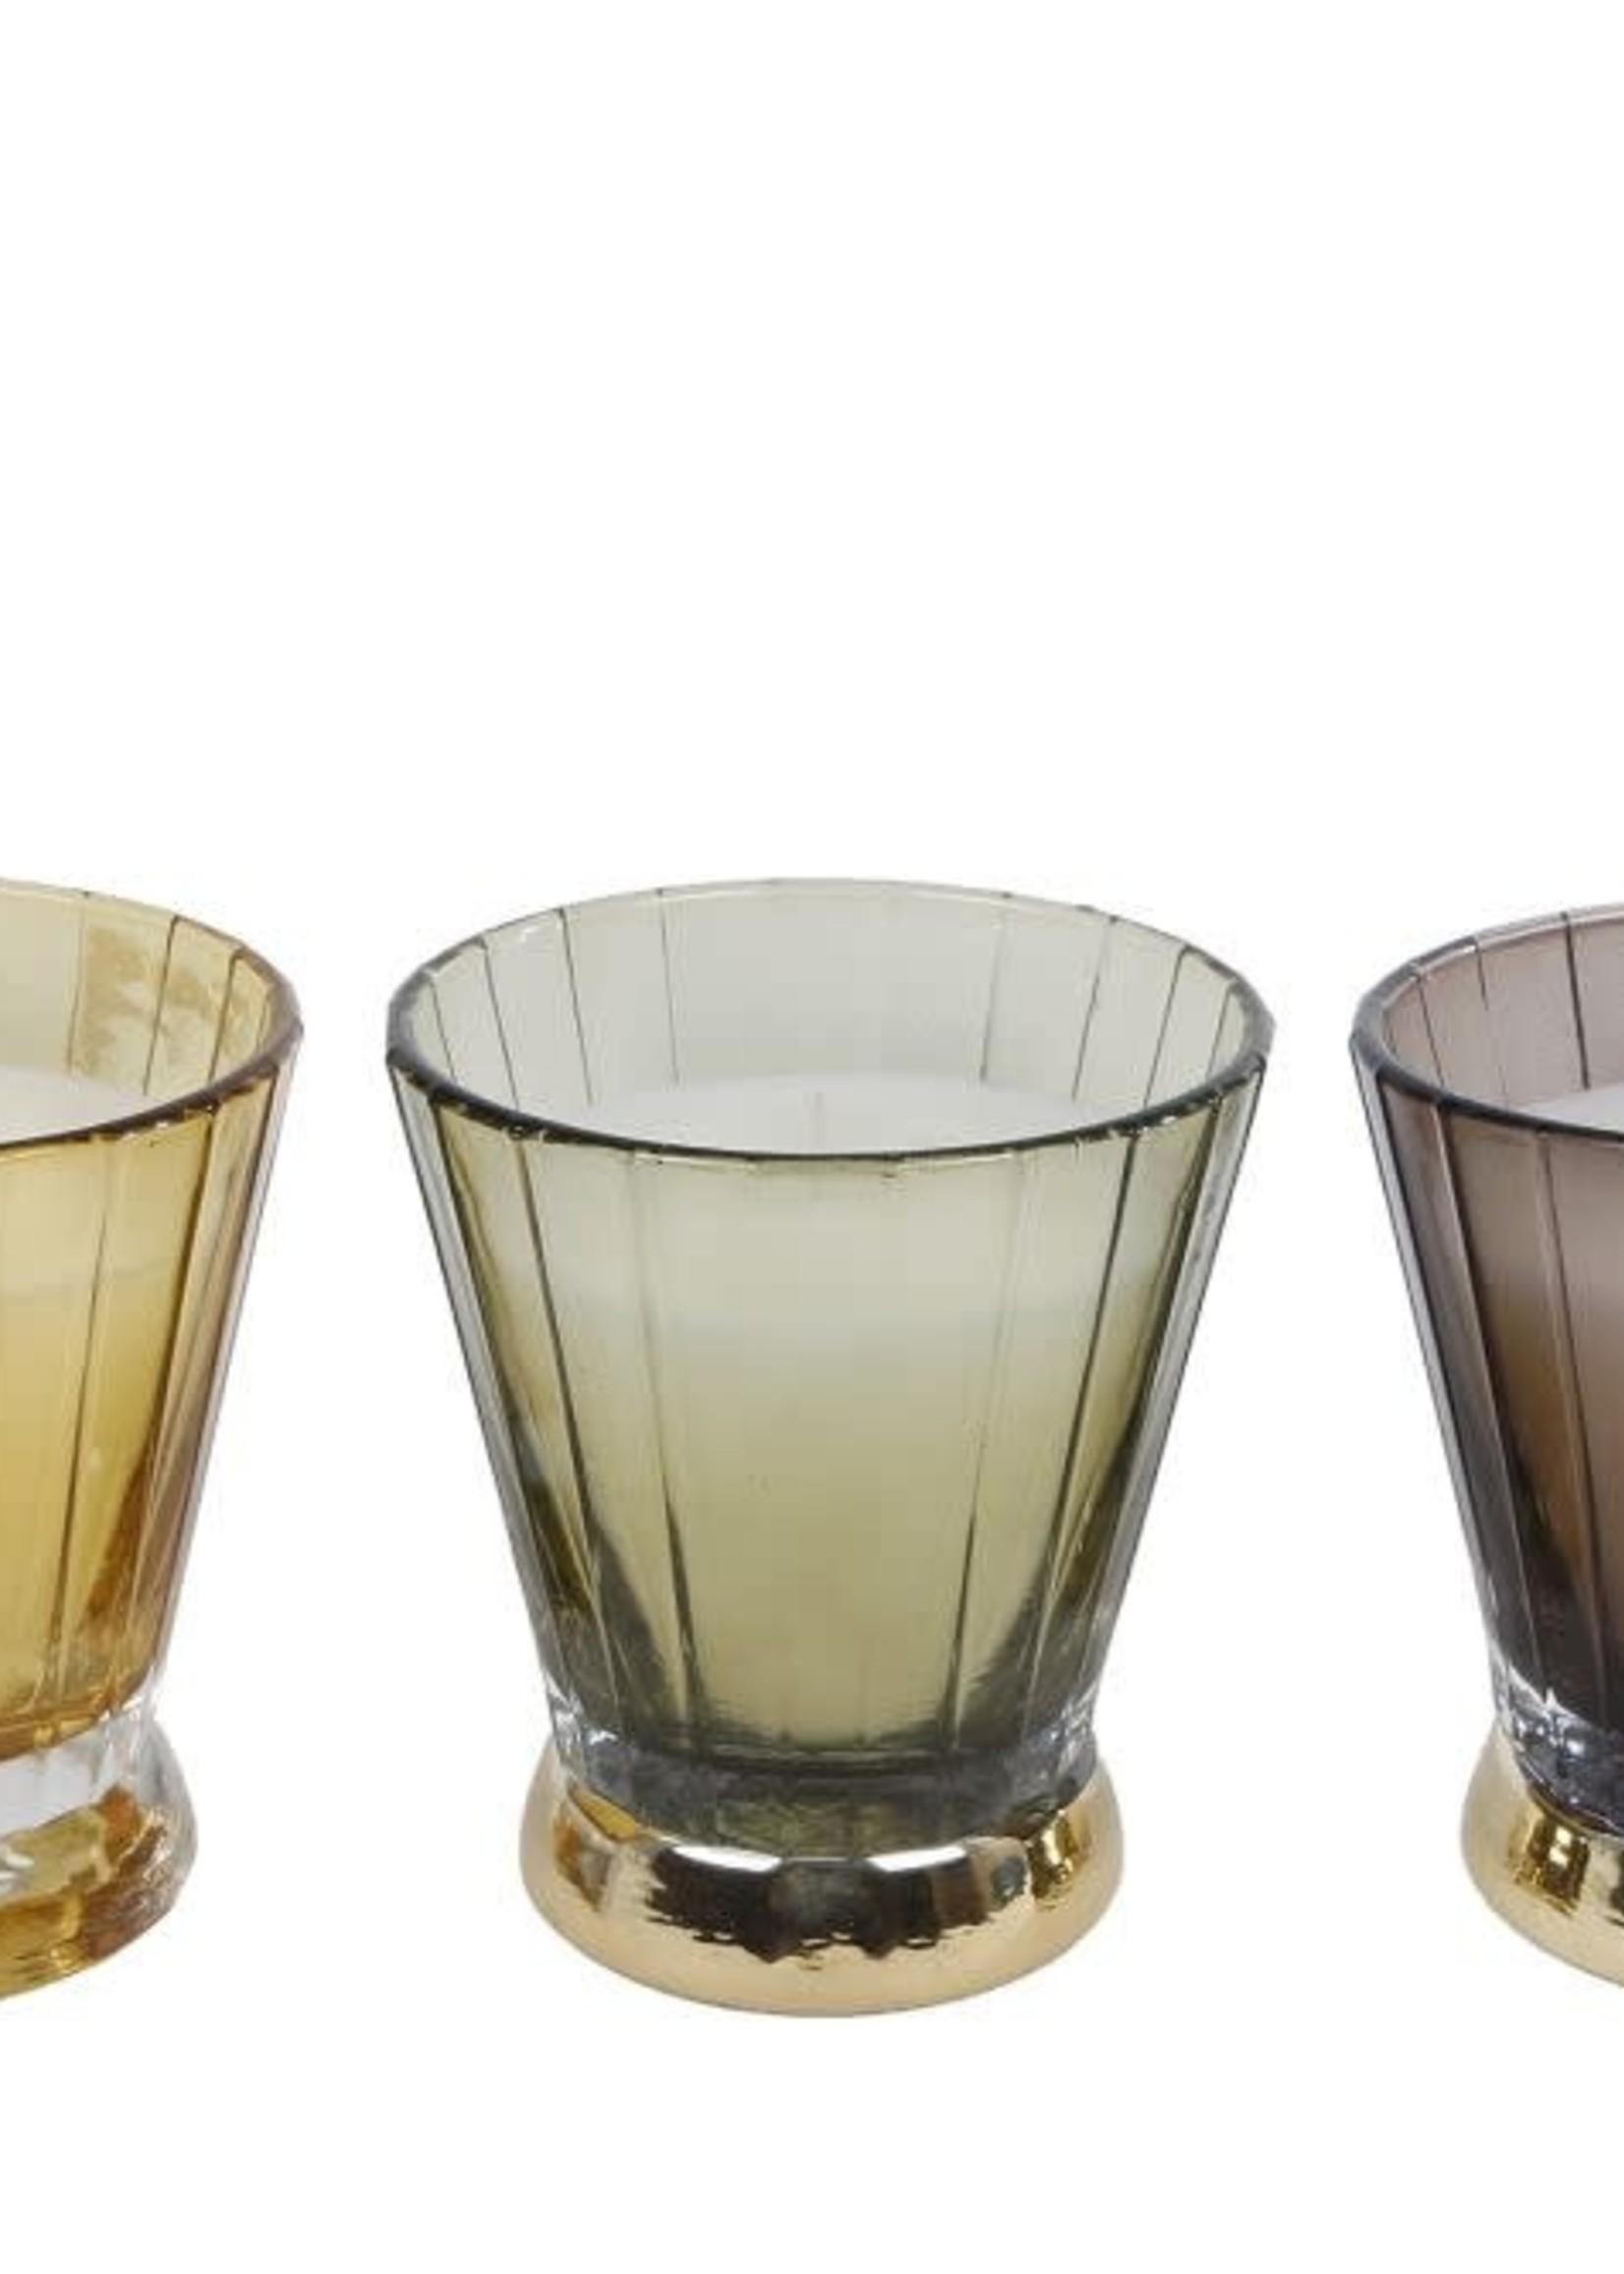 Kaars Mia a3 glas 7,5x7,5x8,8